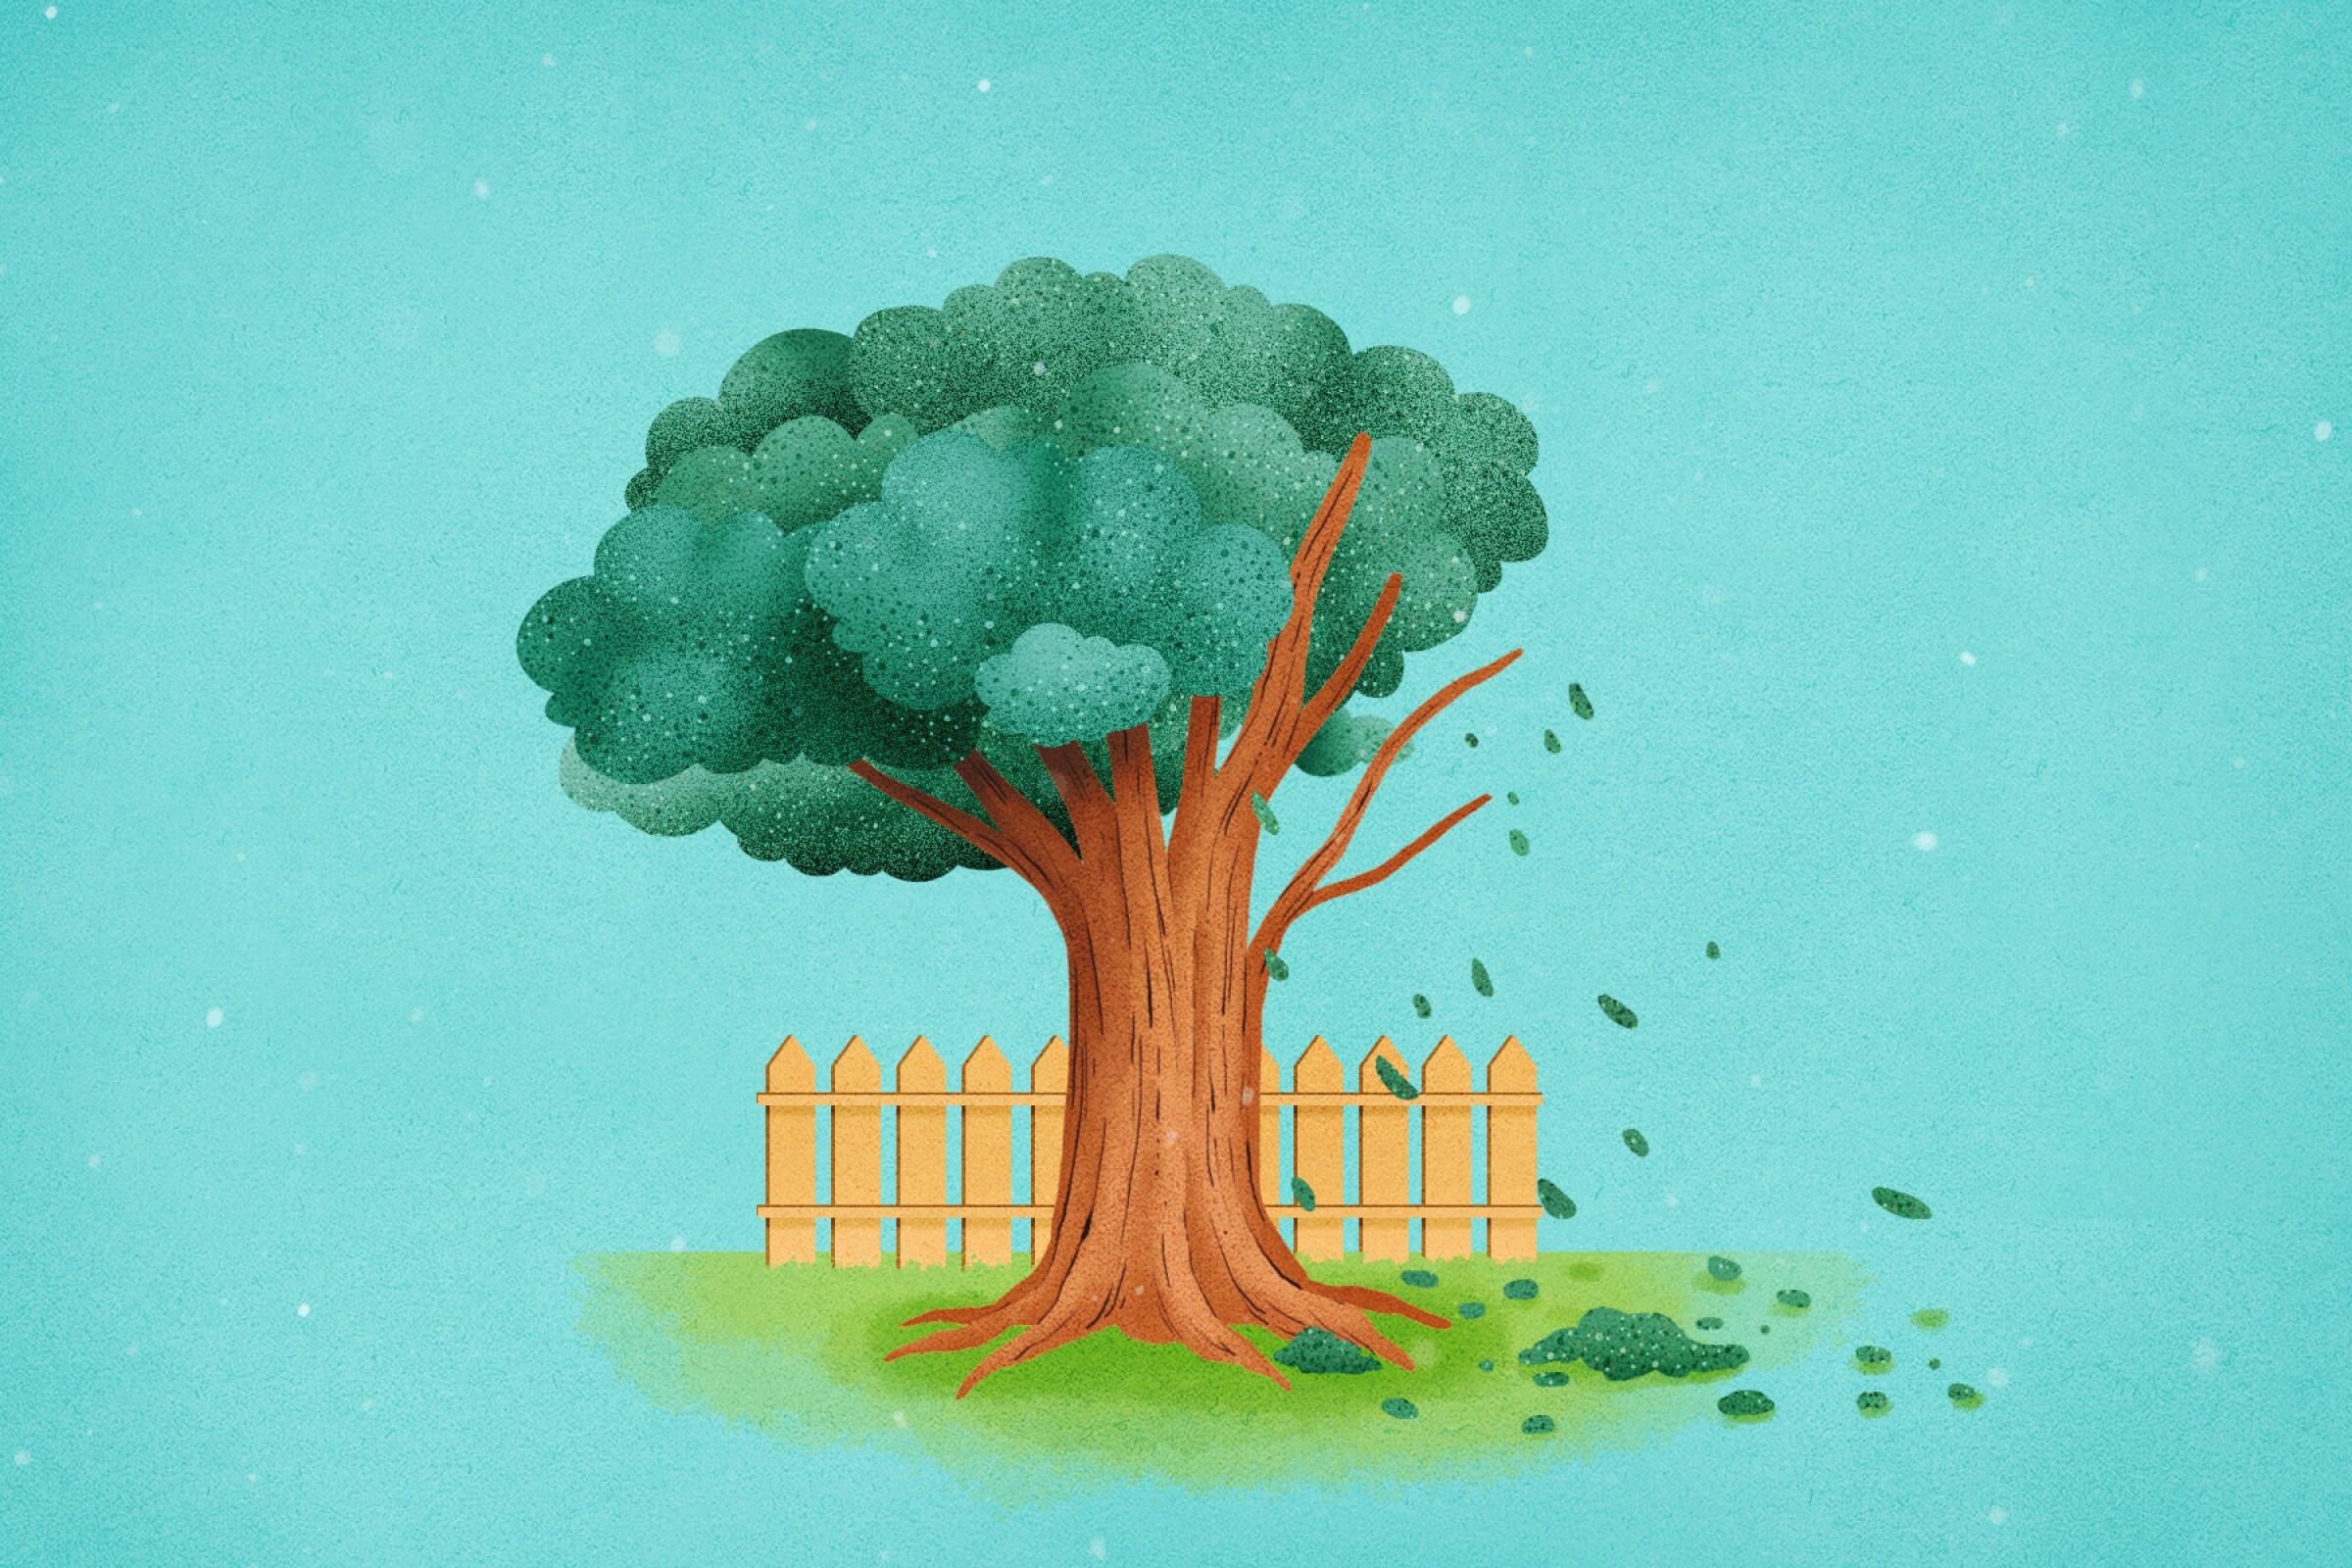 Plants - Dying tree